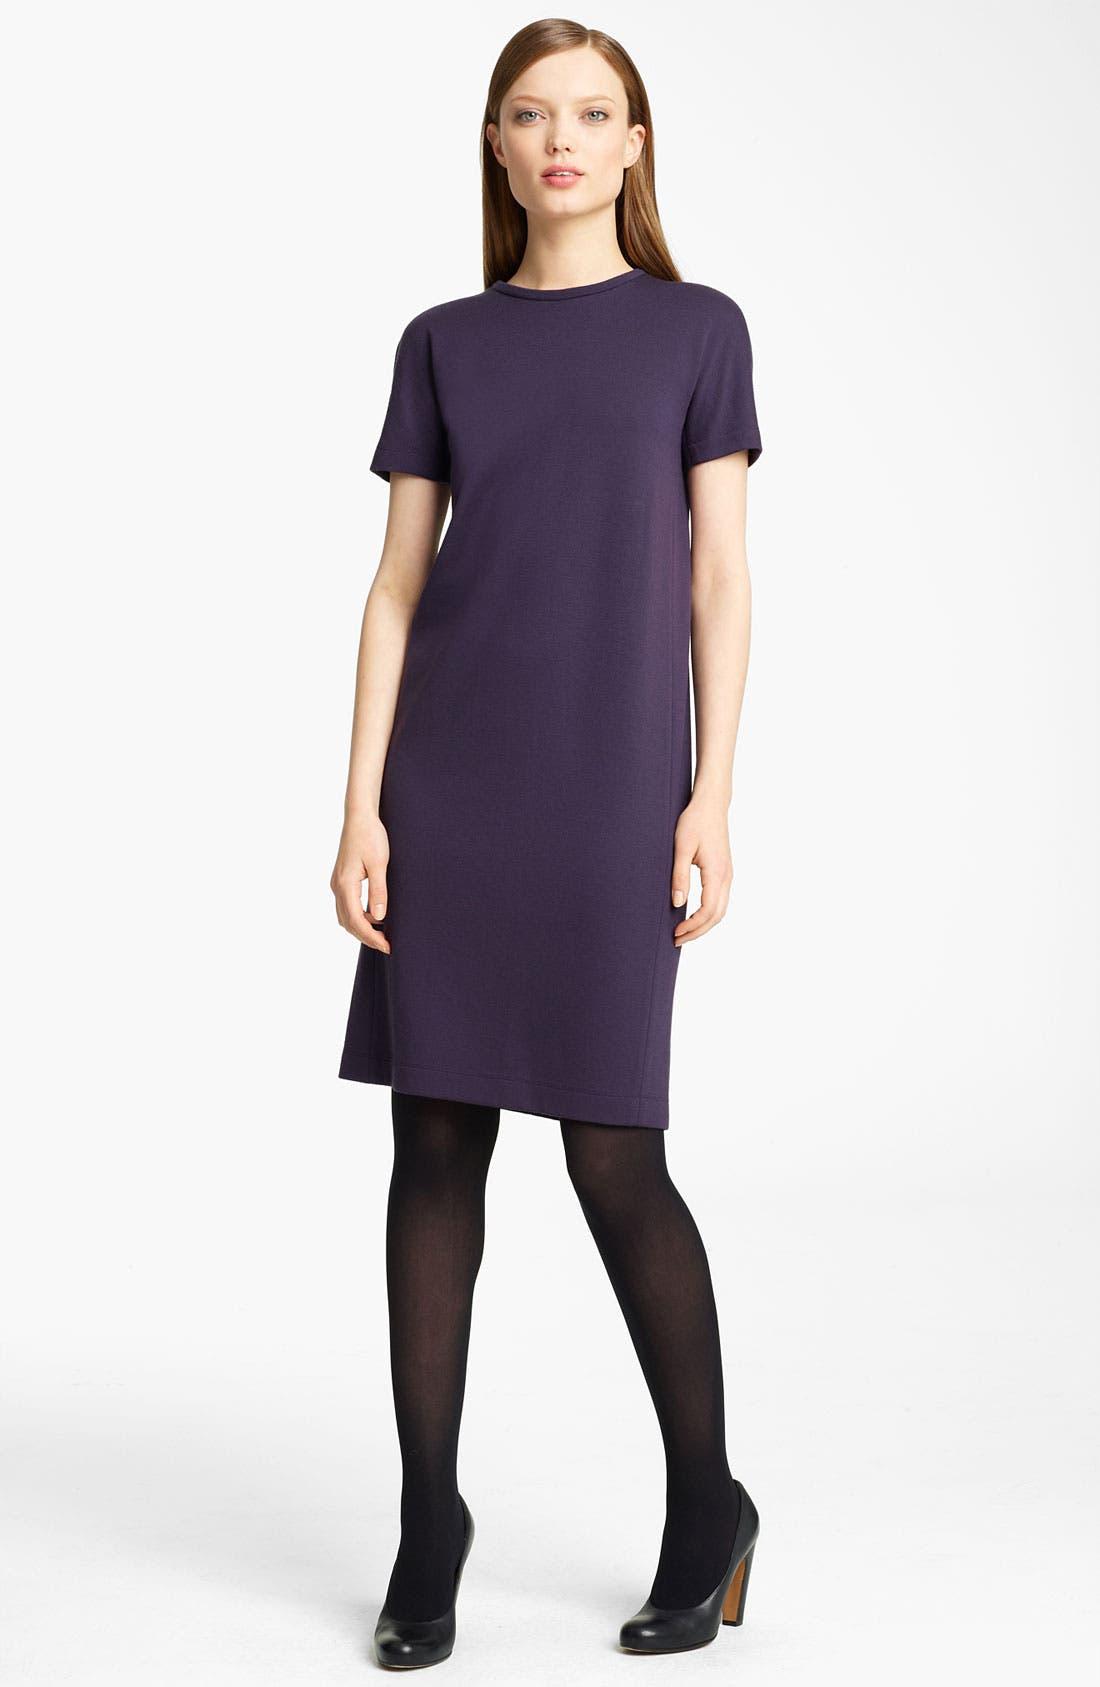 Alternate Image 1 Selected - Lida Baday Knit Wool Sheath Dress